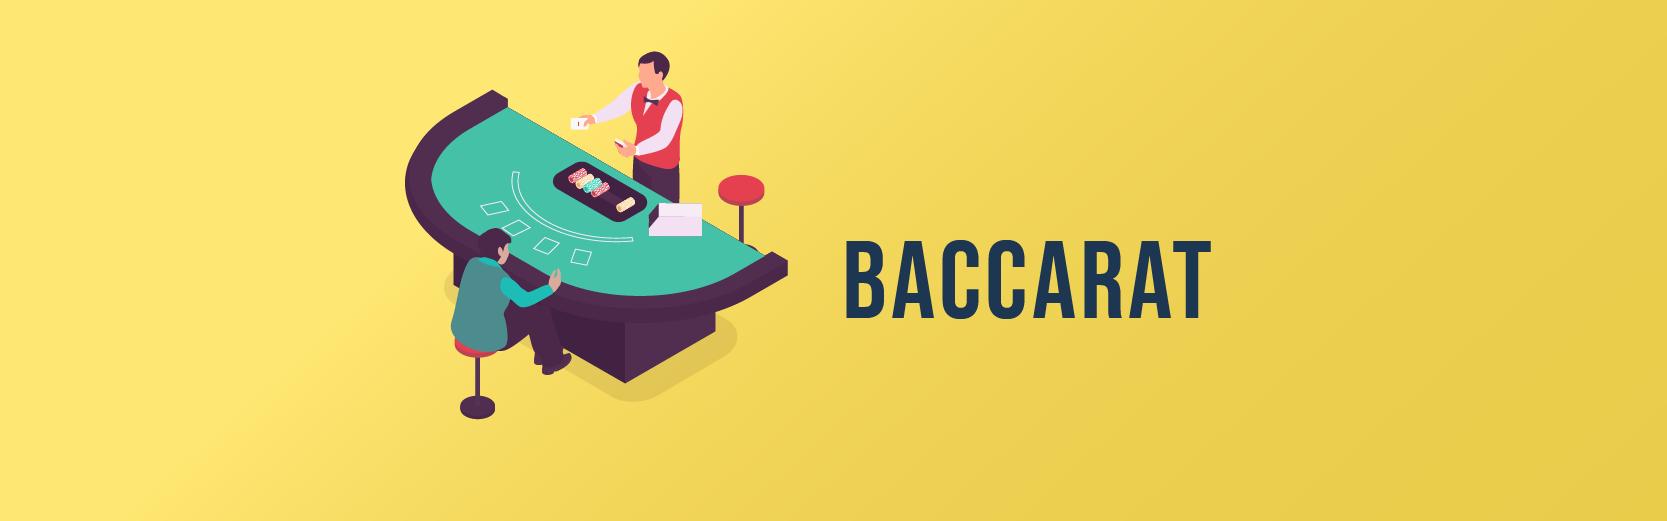 baccarat banner